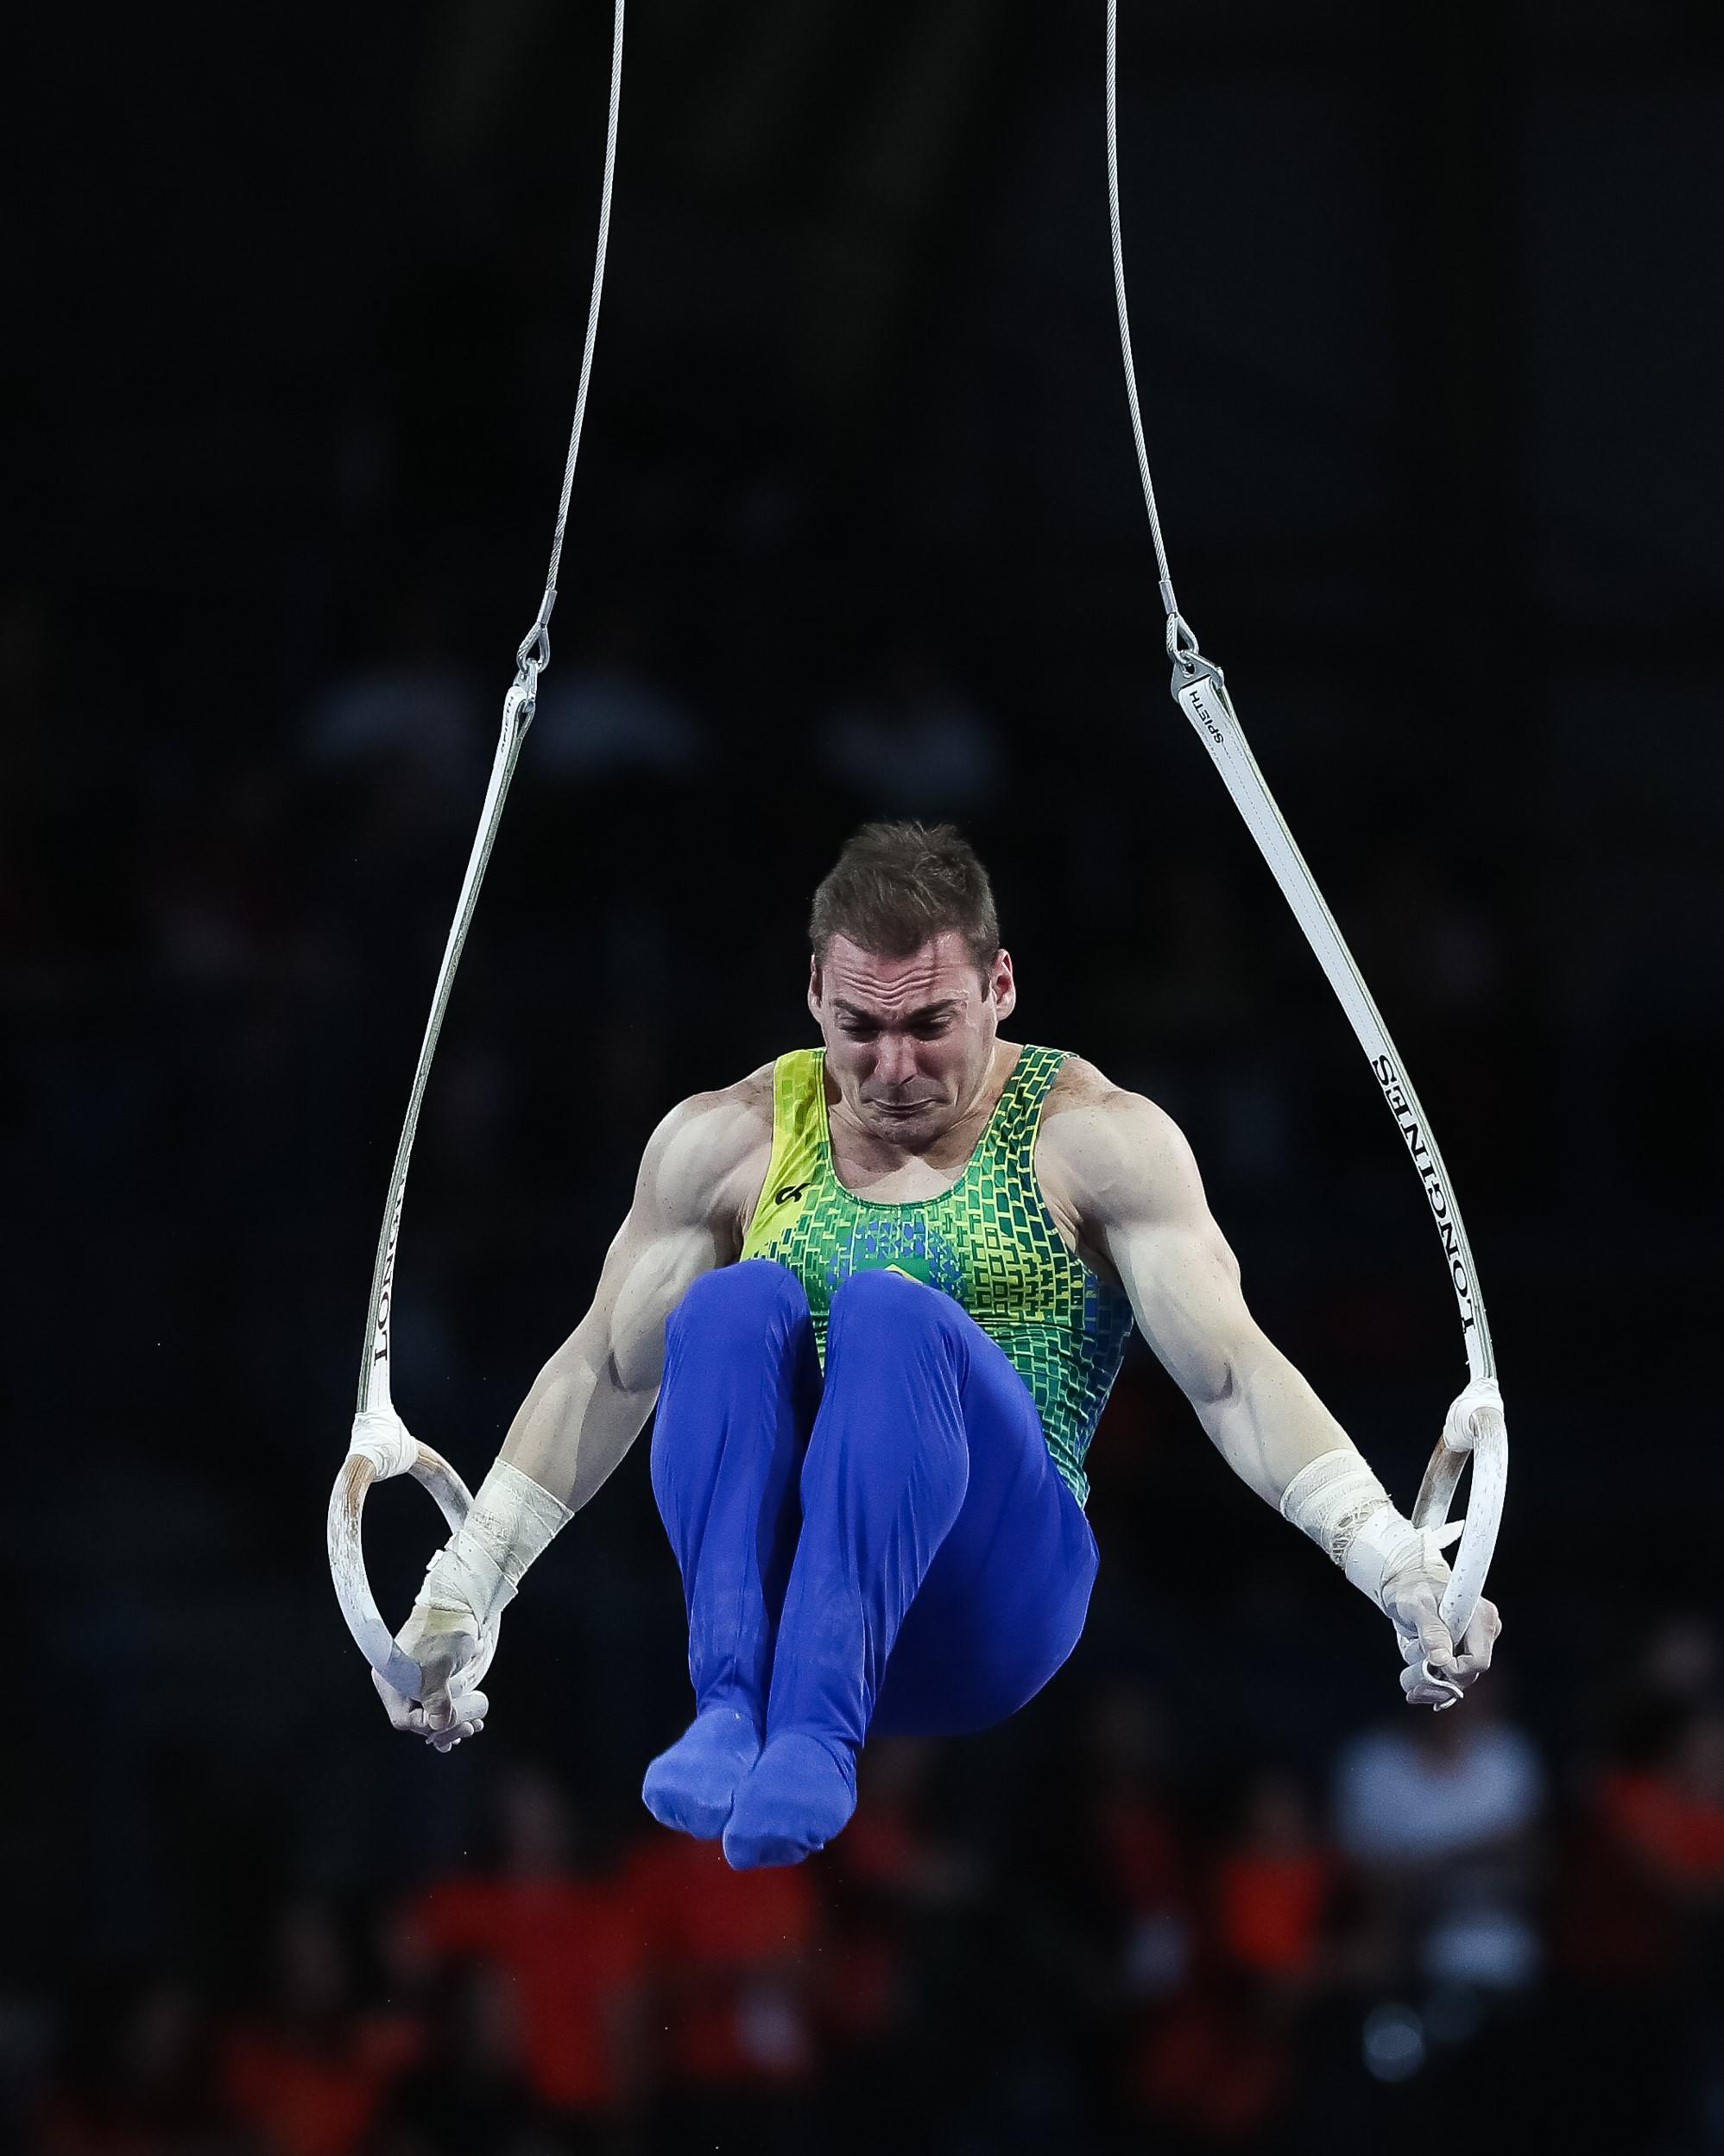 FIG Artistic Gymnastics World Championships | Oct2019 | Hanns-Martin-Schleyer-Halle Arena, Stuttgart, Germany | Photo: Ricardo Bufolin / Panamerica Press / CBG